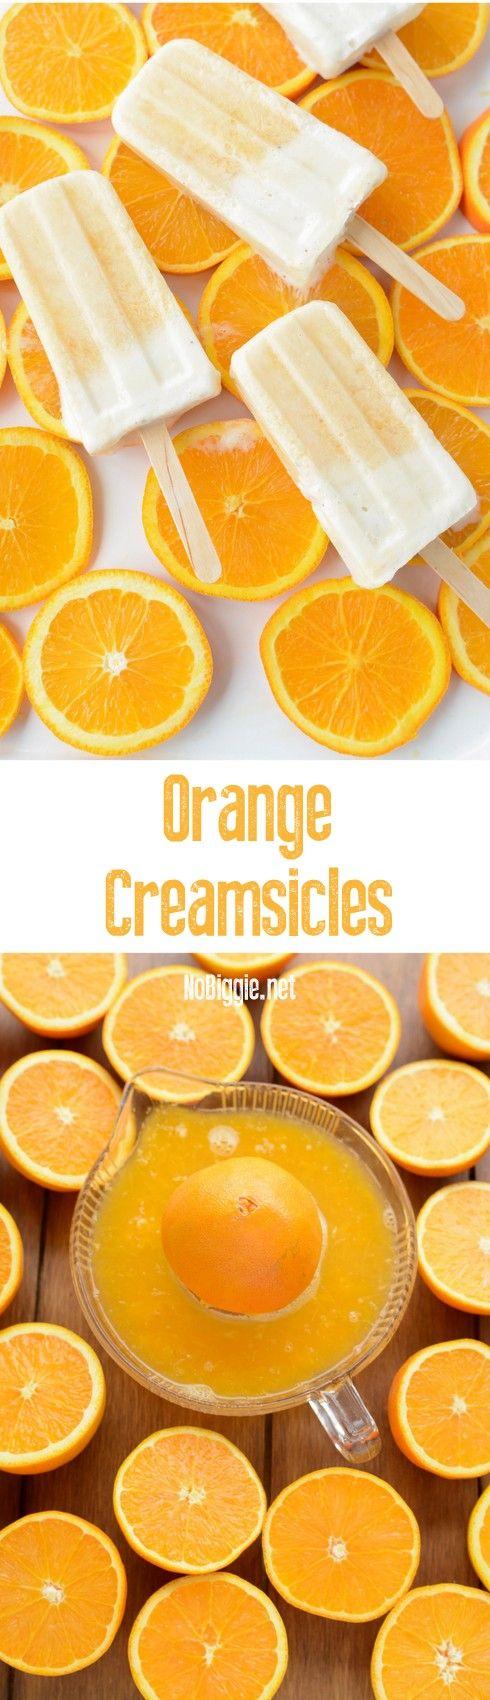 Orange creamsicles   NoBiggie.net